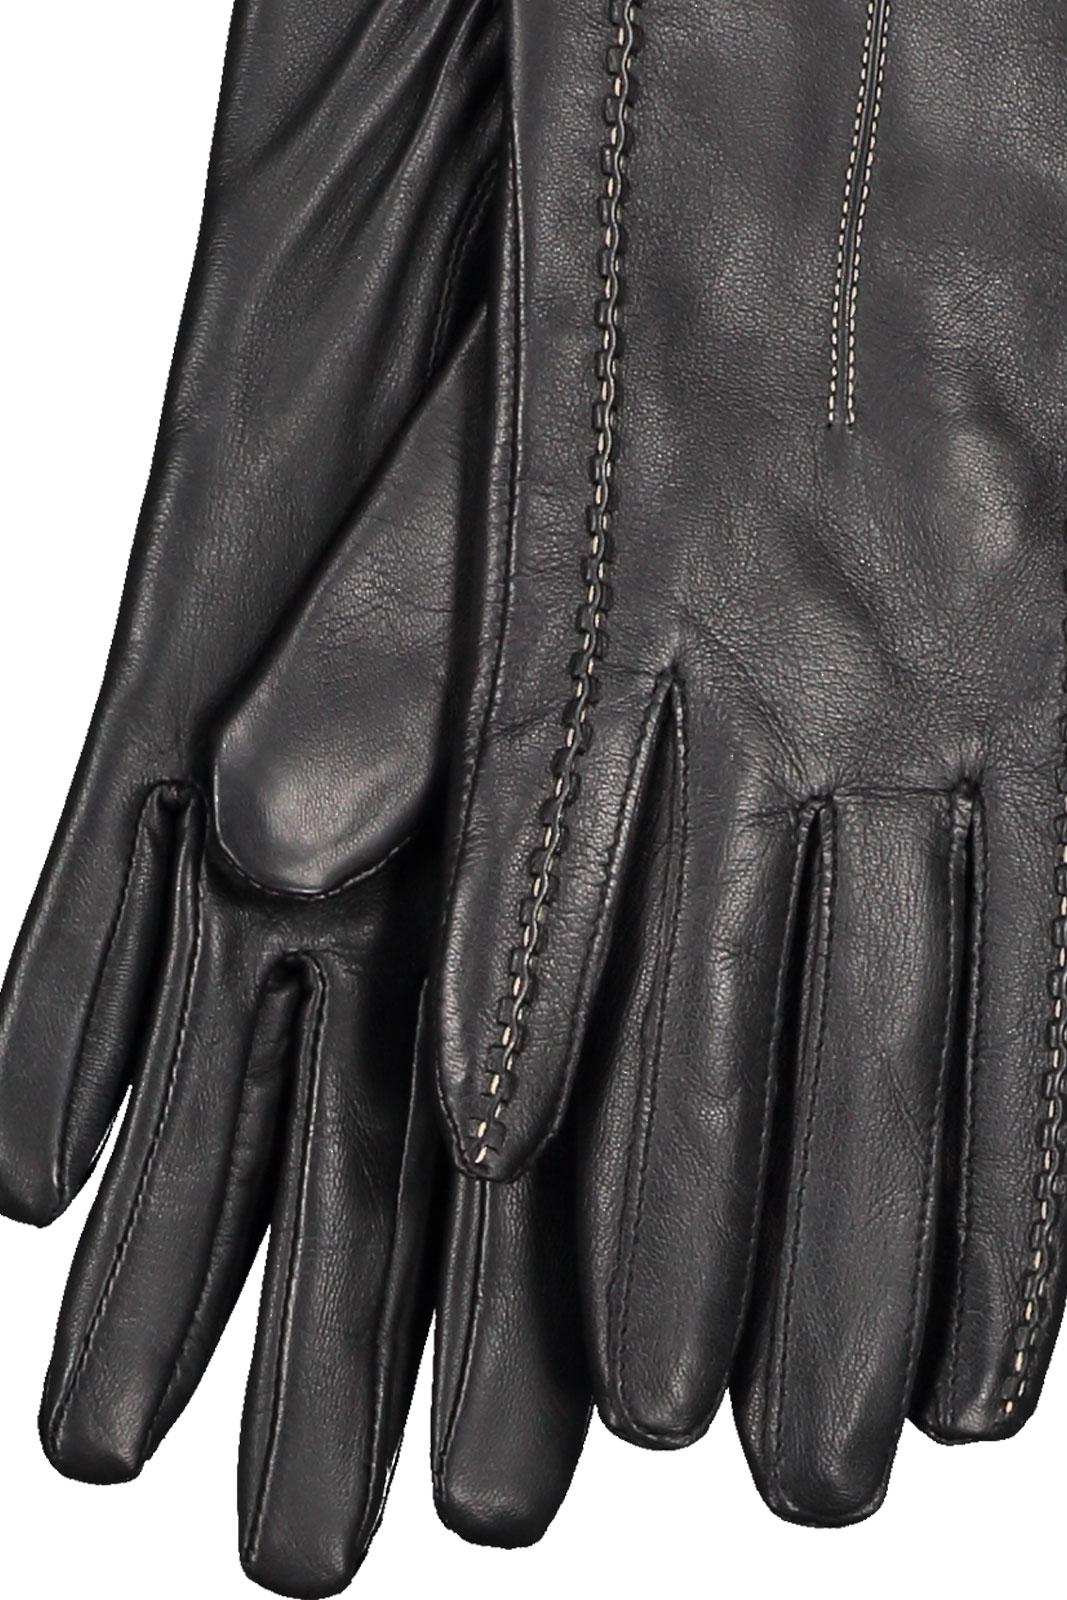 dam handskar skinn